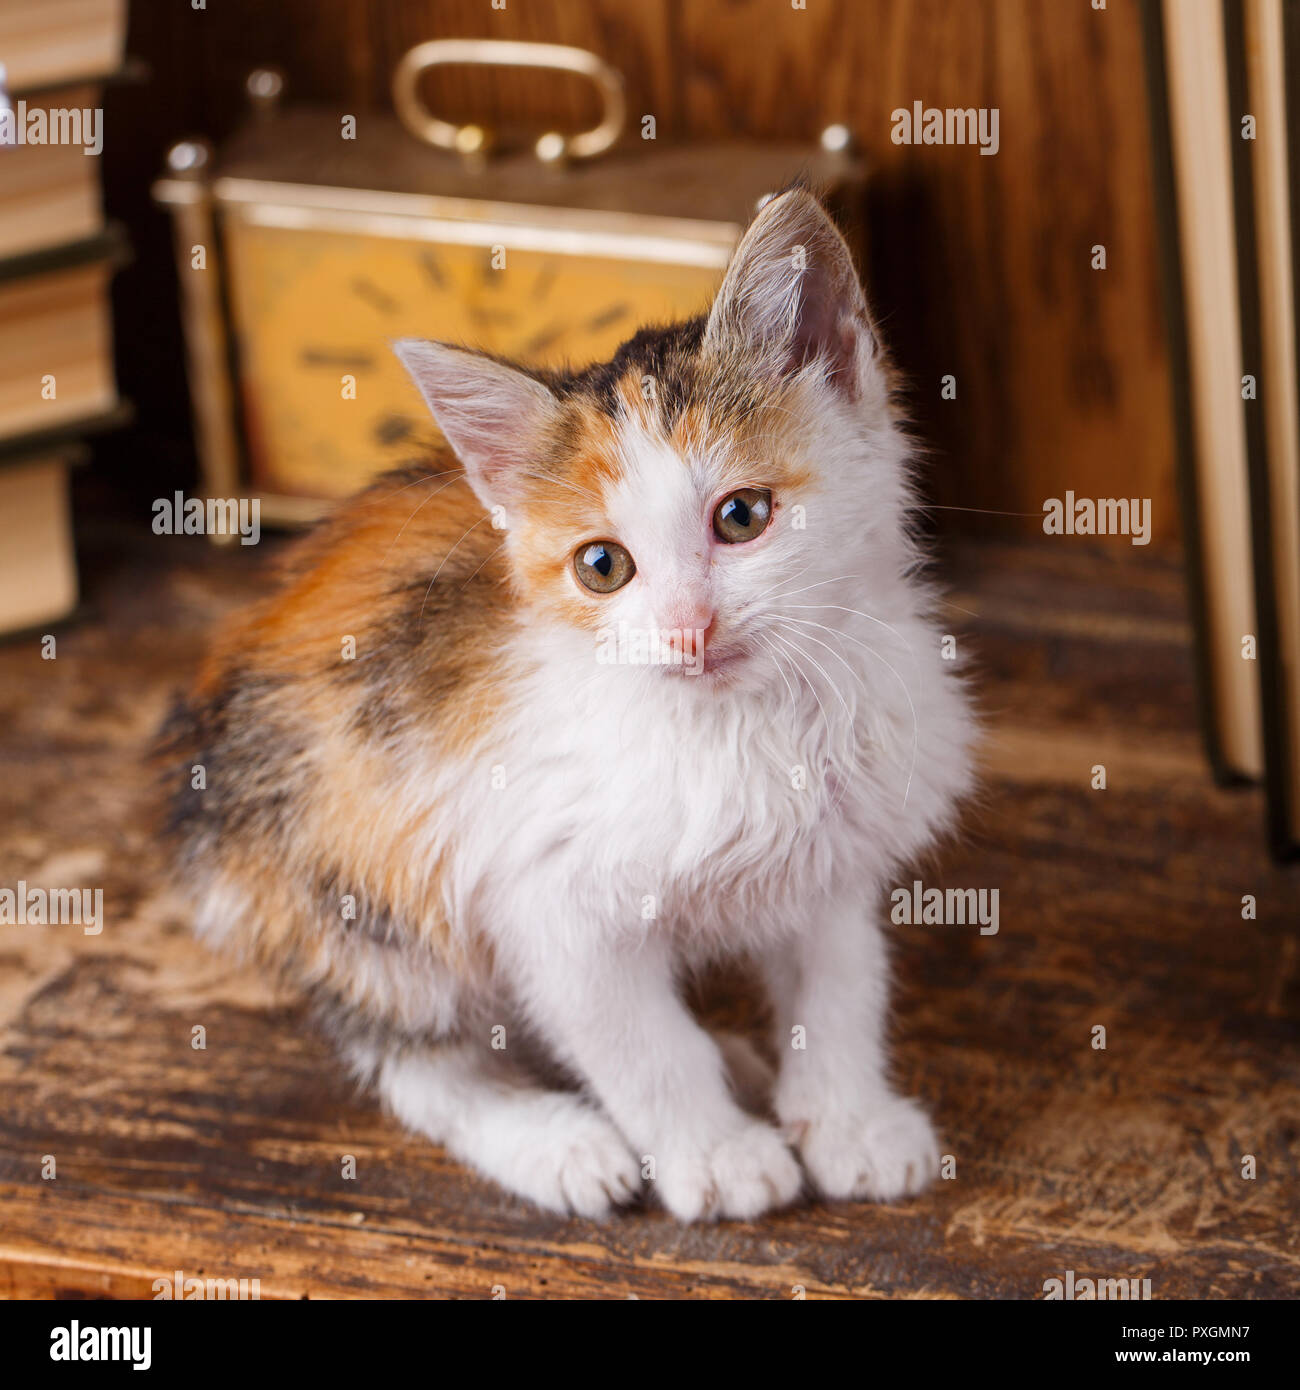 The cat on the bookshelf. Little playful kitten. - Stock Image